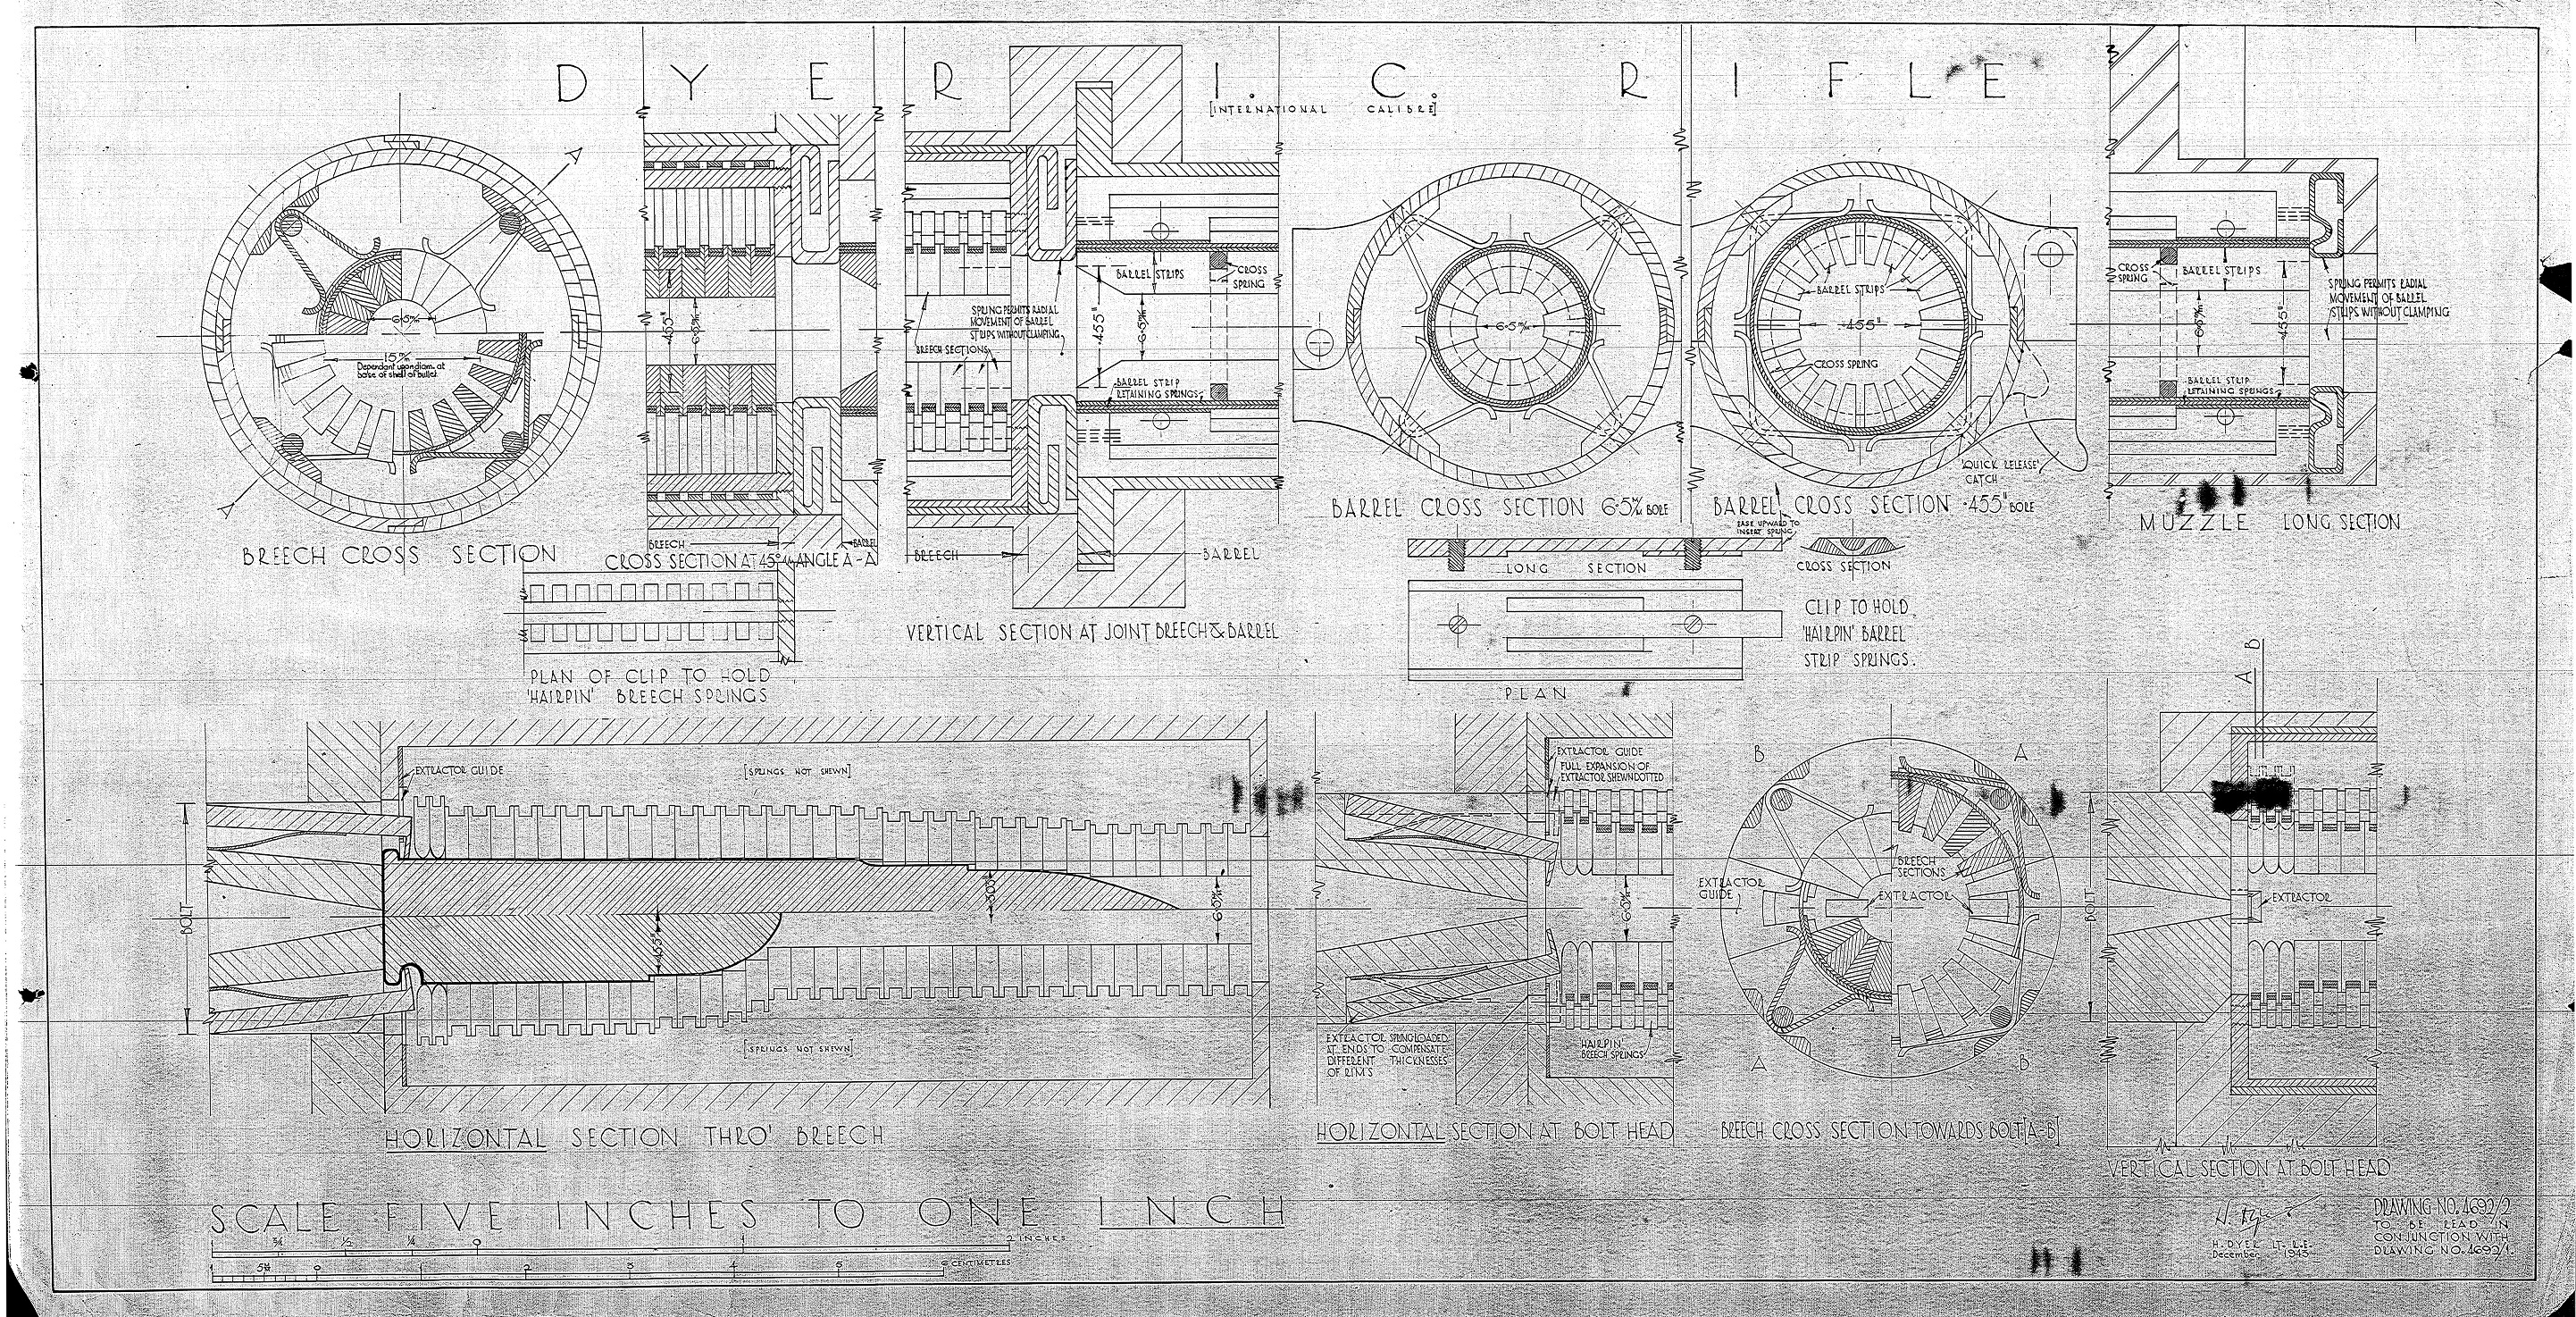 marlin glenfield model 60 parts diagram kenwood kdc 352u wiring enfield rifle swedish mauser ~ elsavadorla